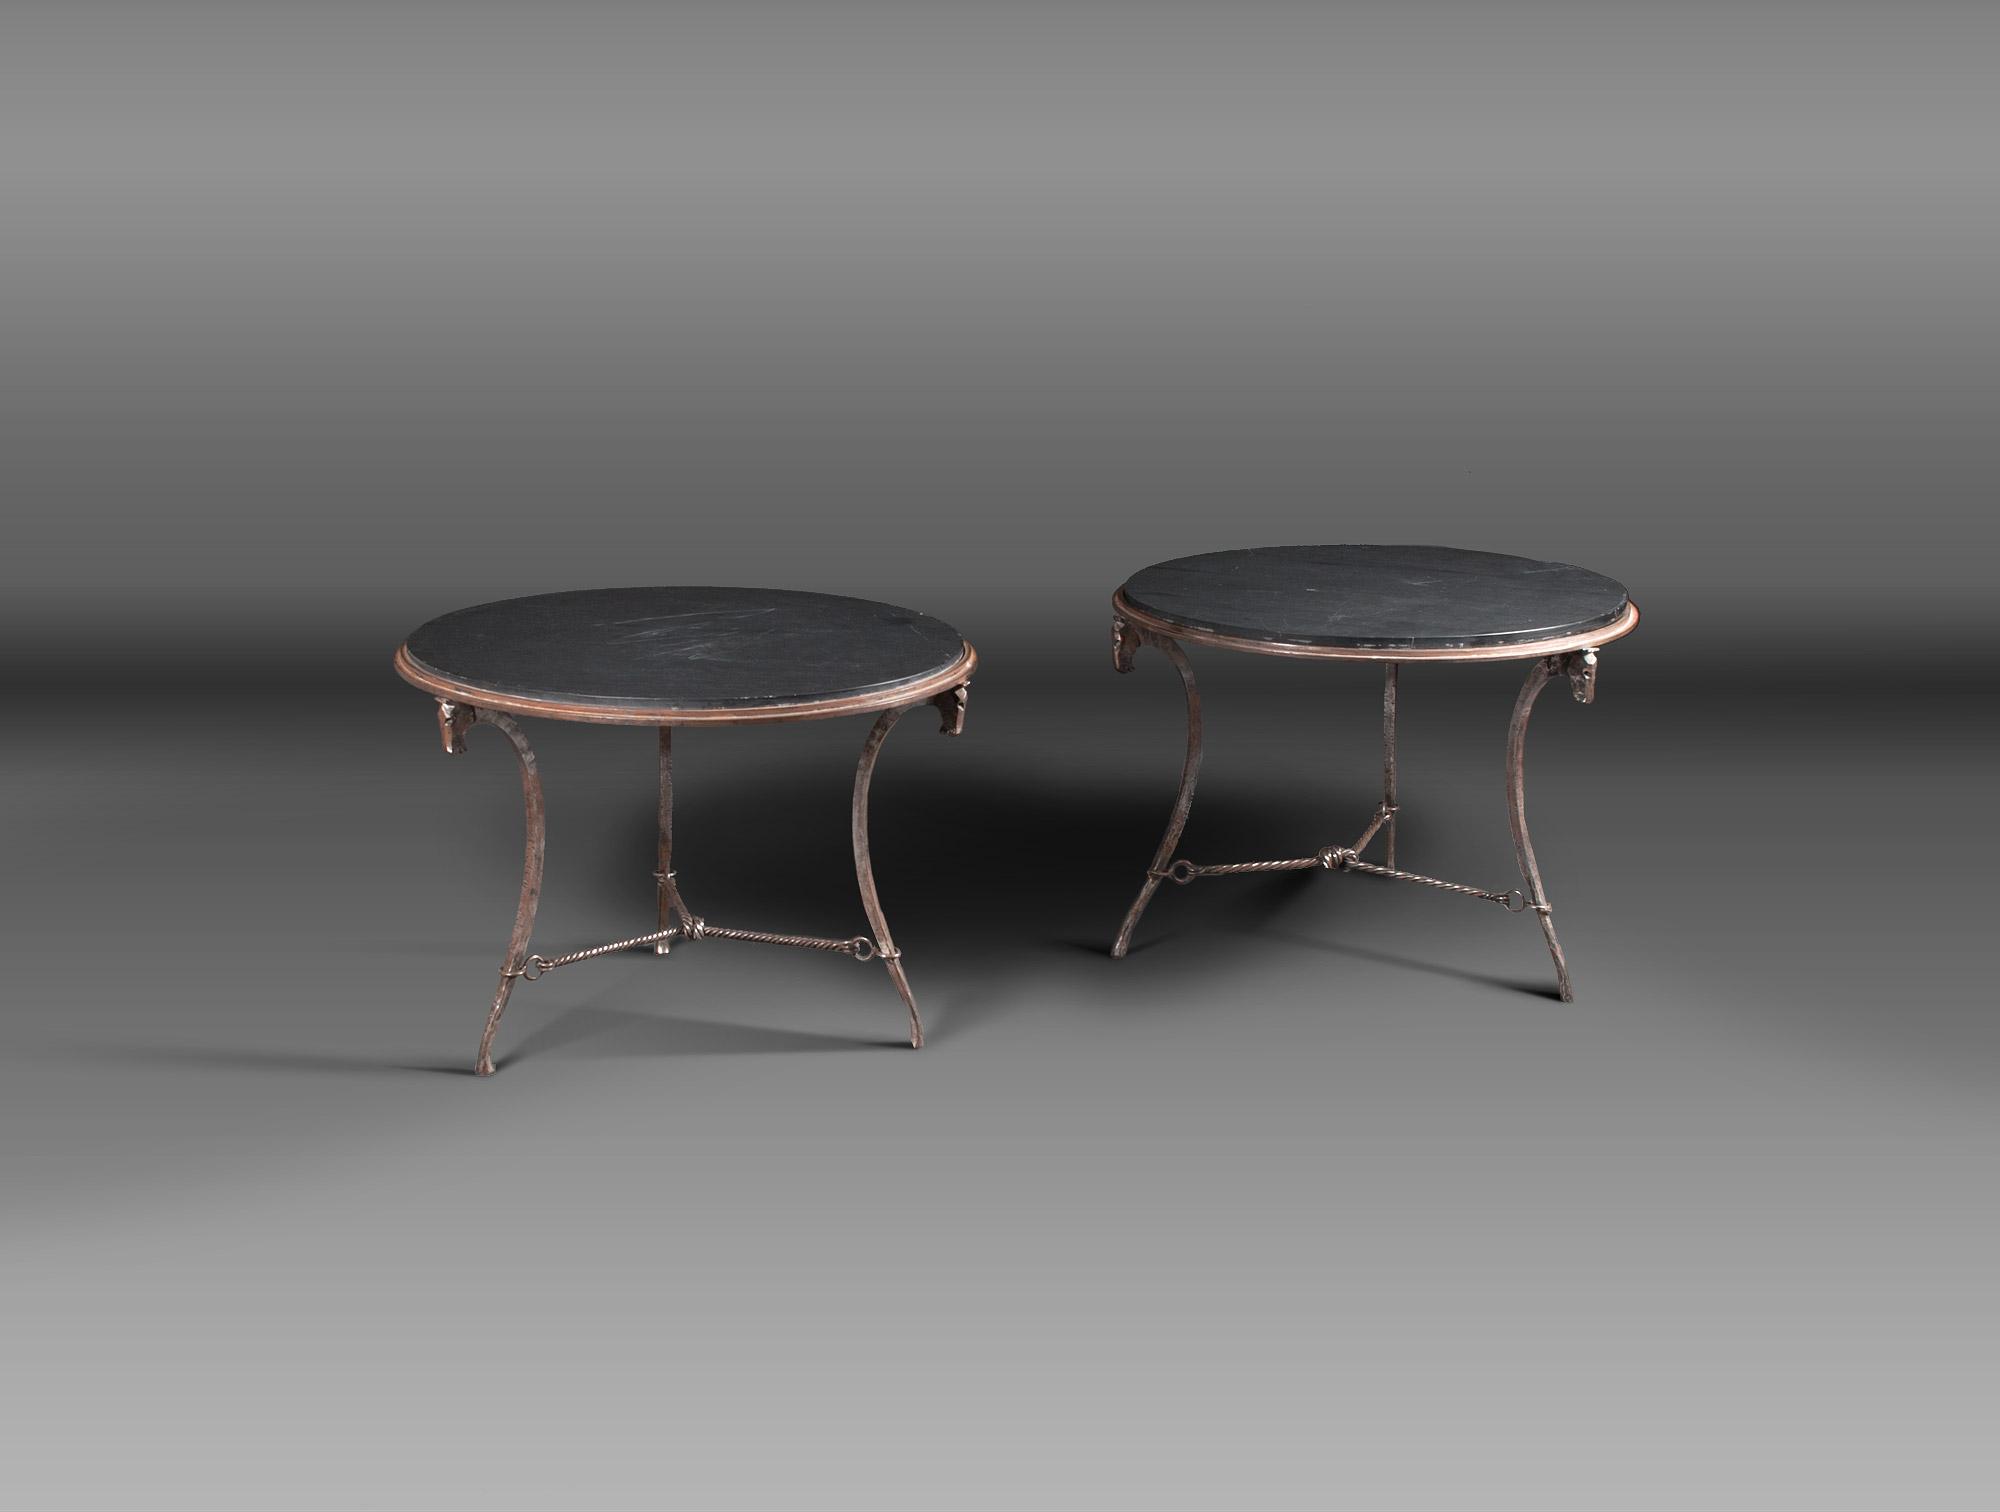 Fantastic Pedestal Wrought Iron And Slate Soubrier Rent Tables Desk Beatyapartments Chair Design Images Beatyapartmentscom